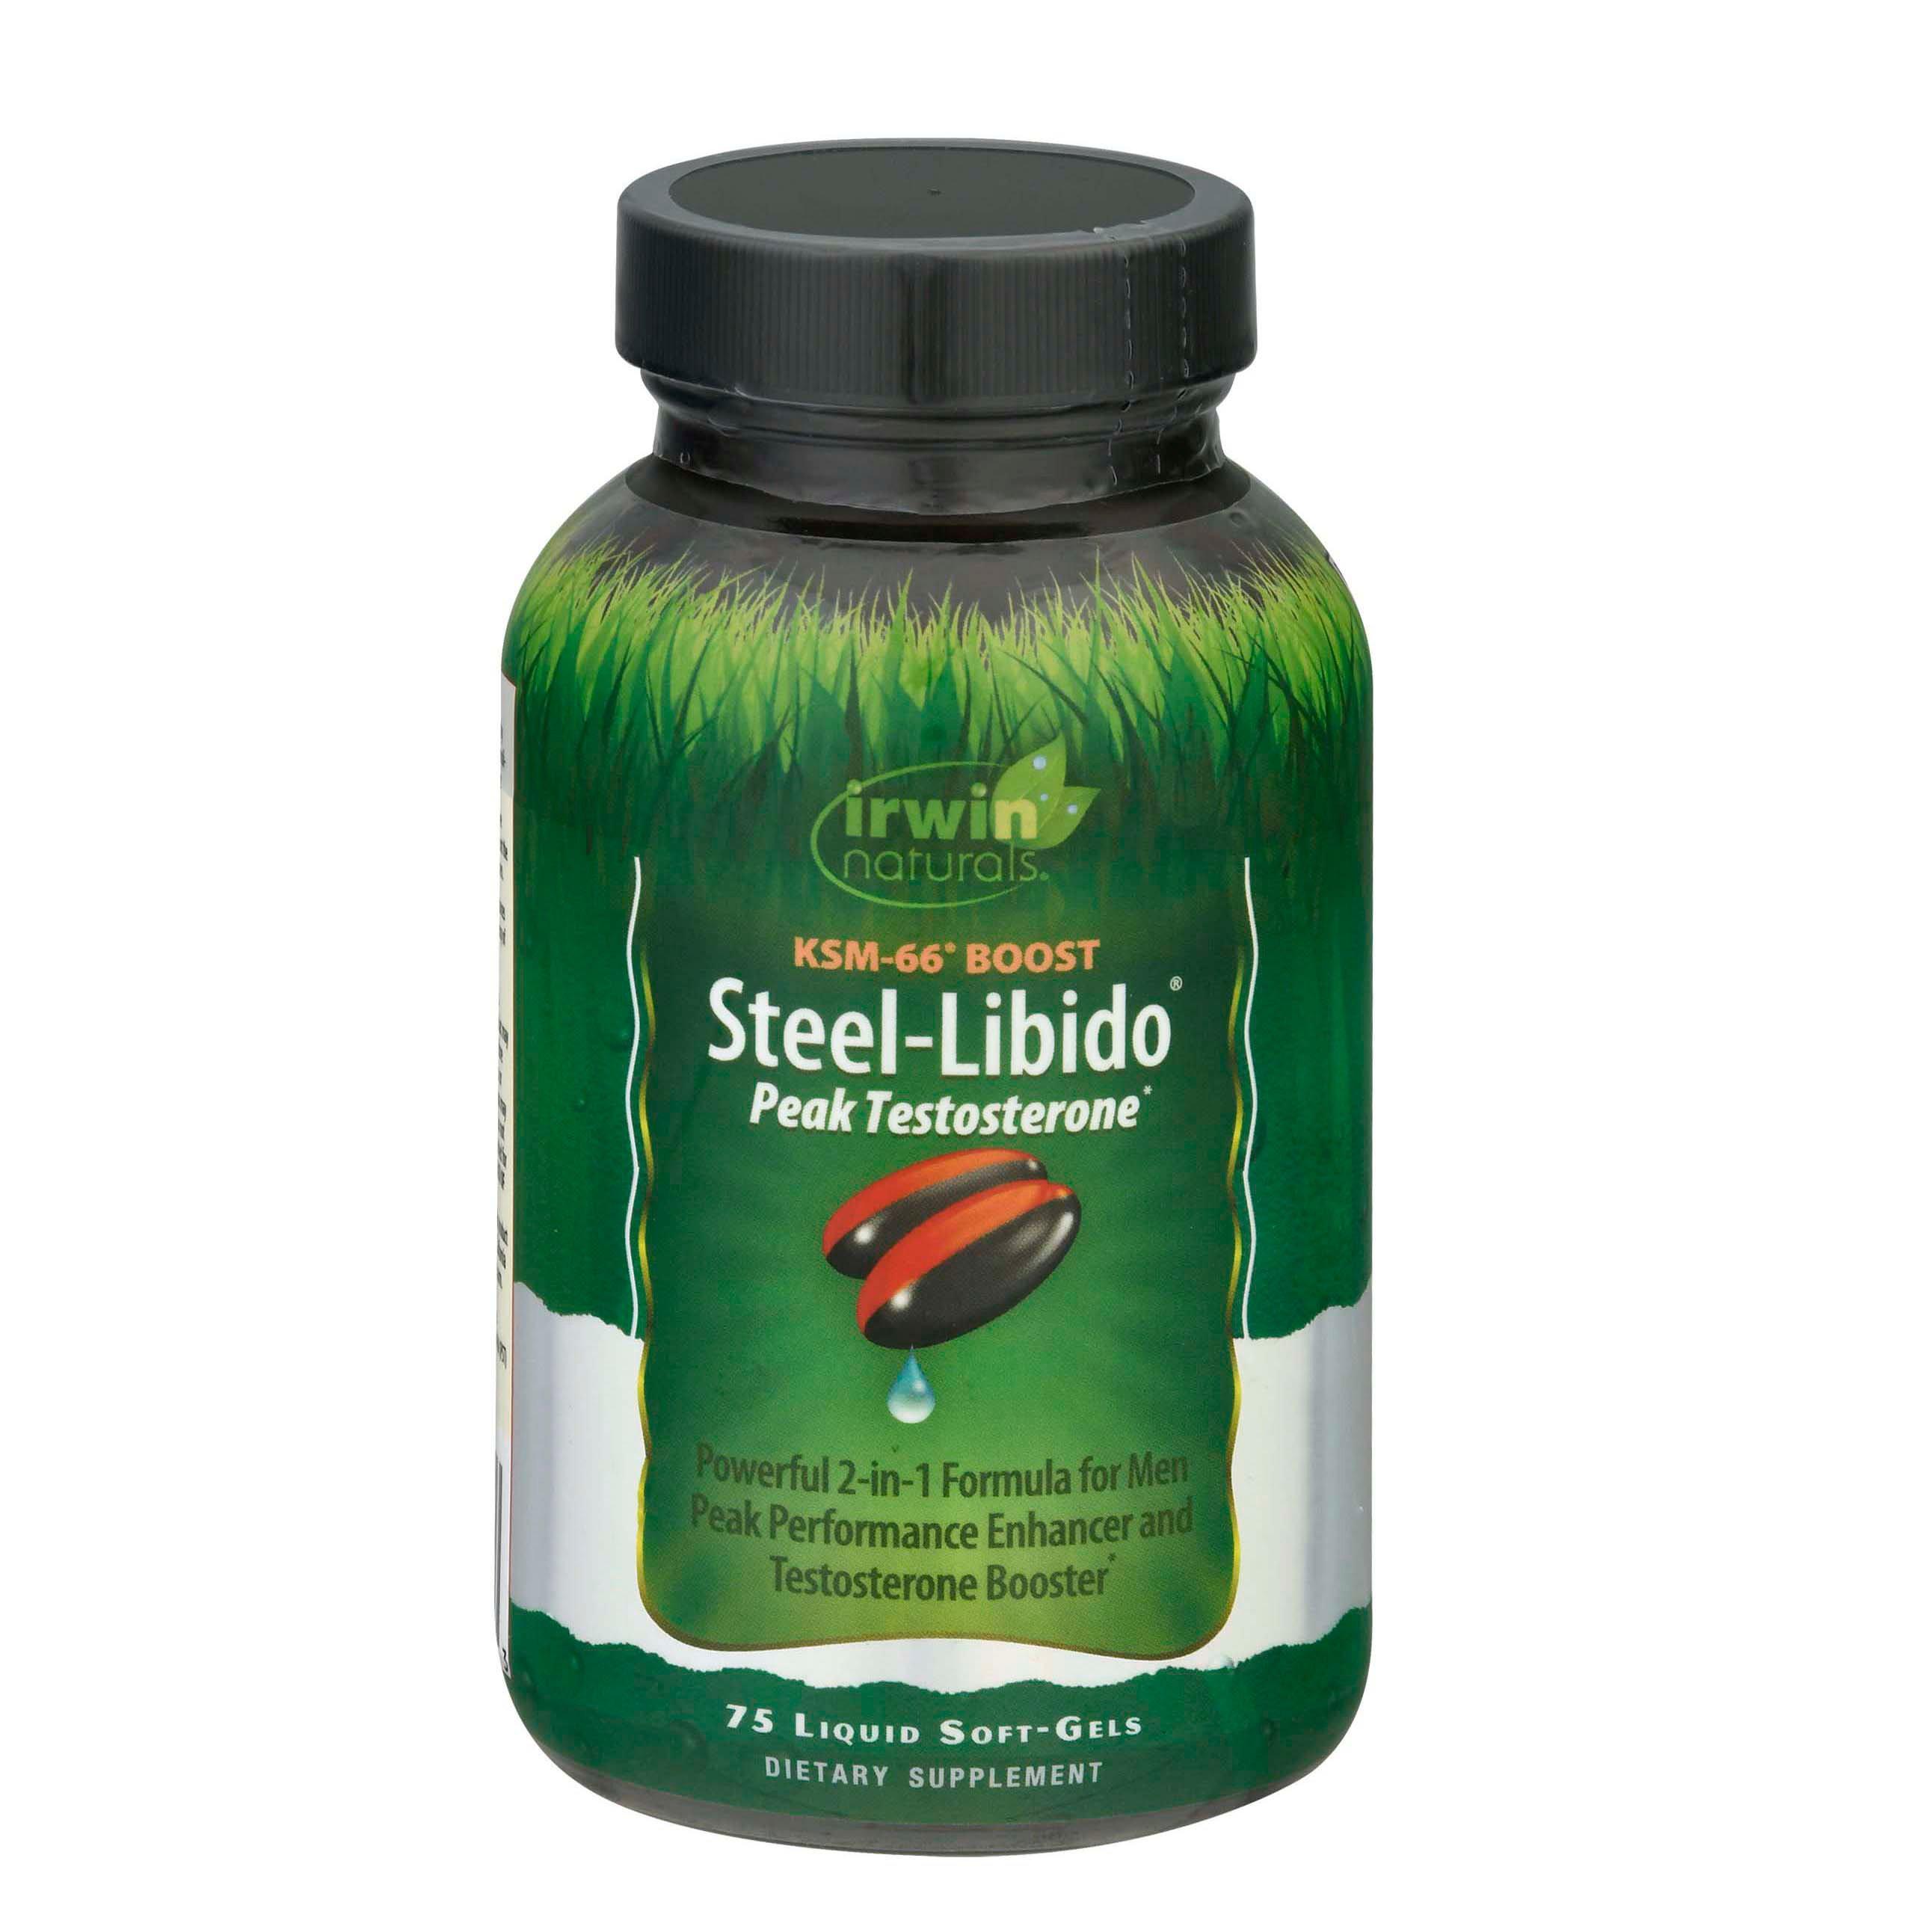 Irwin Naturals Steel Libido Peak Testosterone Softgels - Shop Diet & Fitness at H-E-B